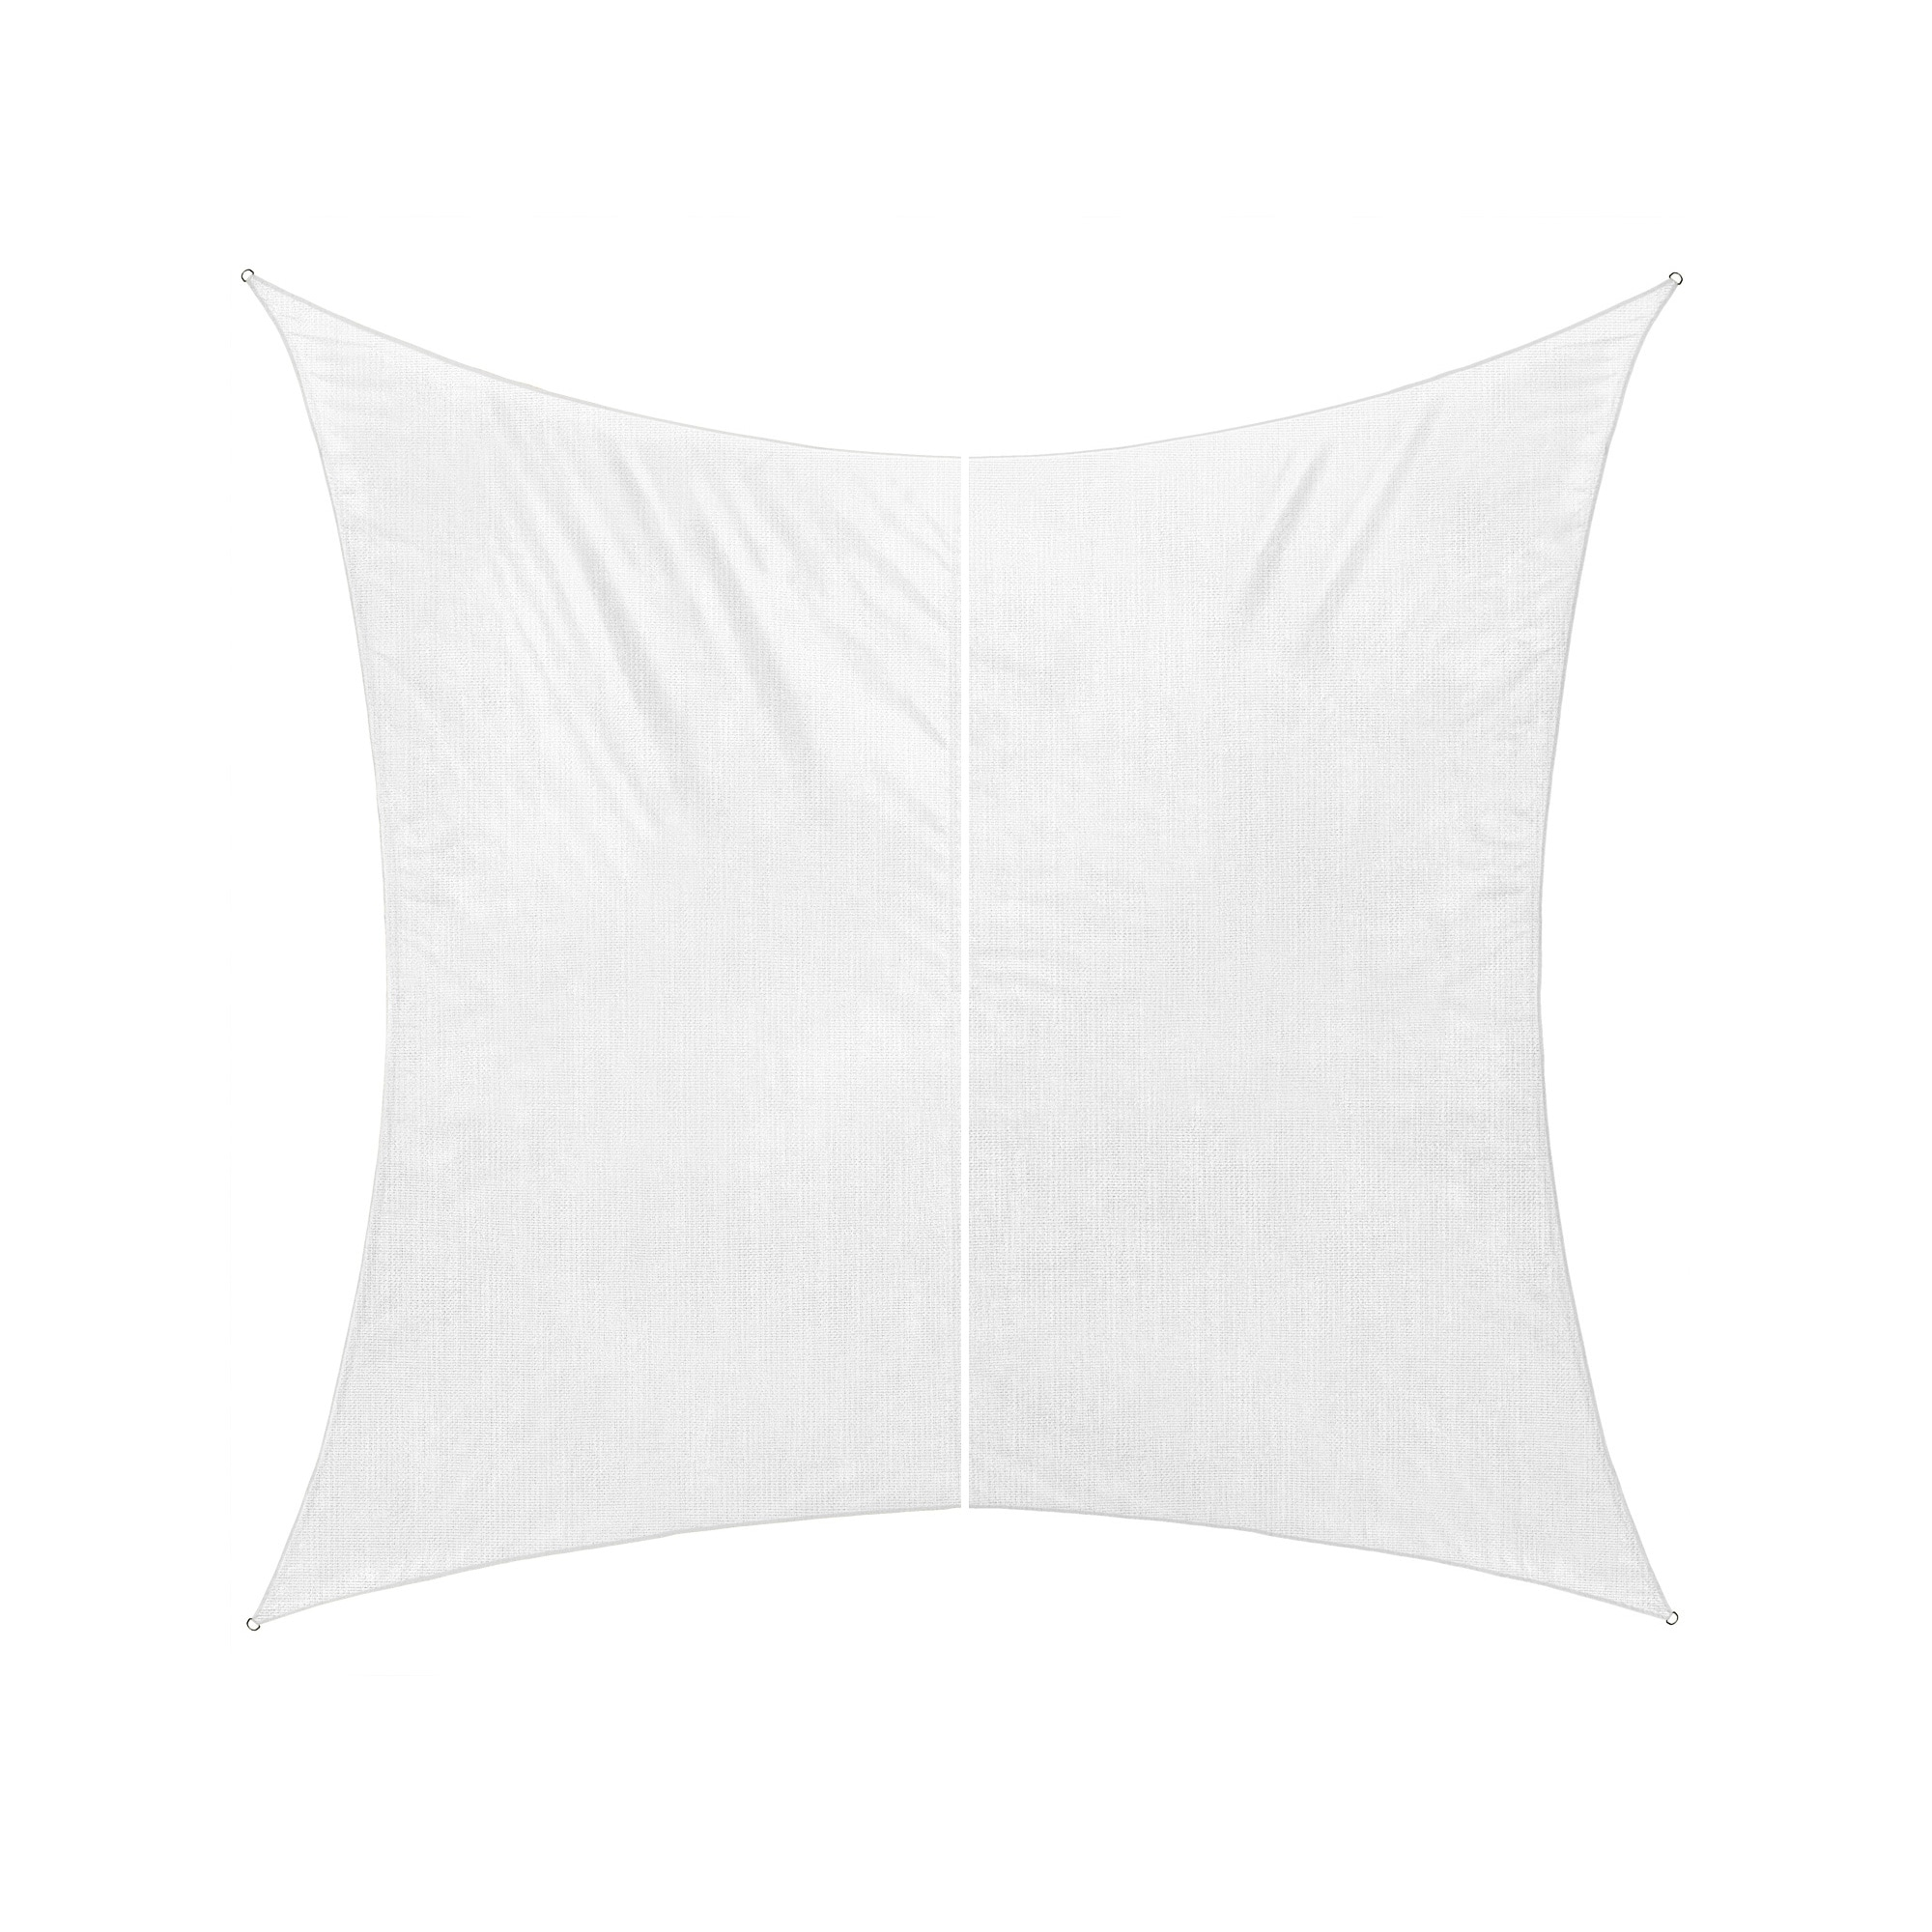 voile d 39 ombrage toile tissu respirant ou imperm able r sistant aux uv jarolift ebay. Black Bedroom Furniture Sets. Home Design Ideas